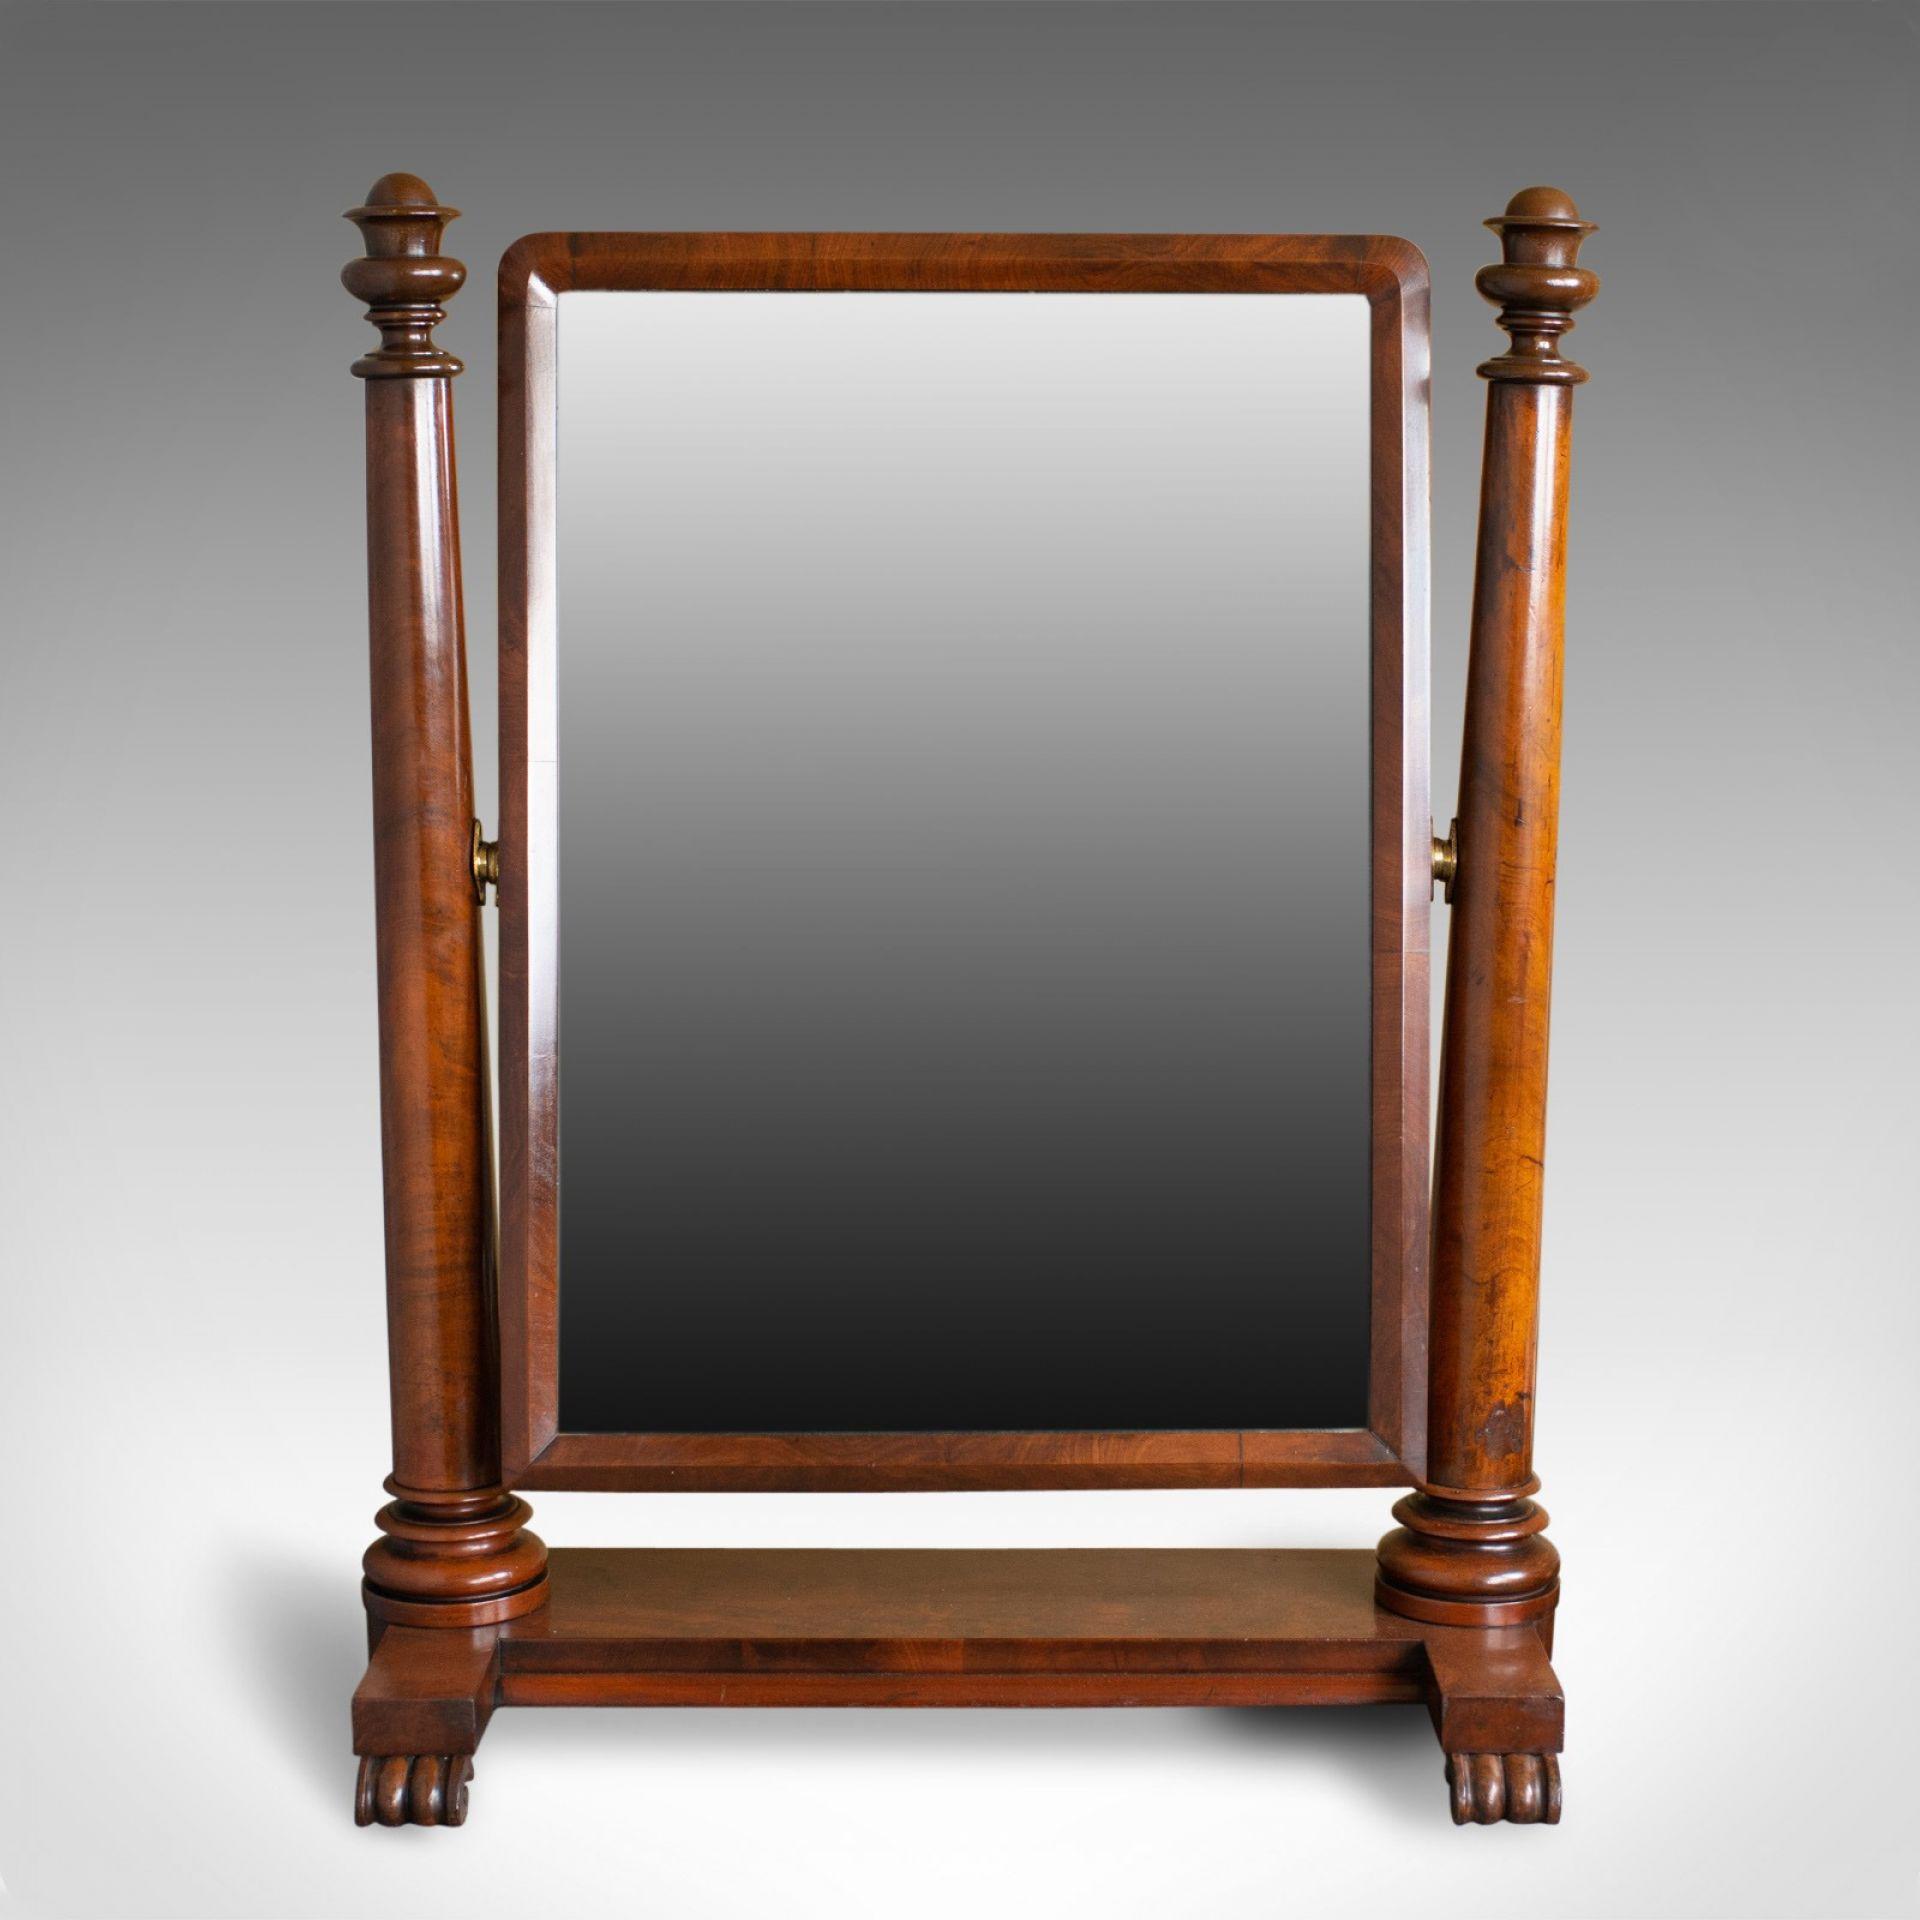 Large Antique Vanity Mirror, English, Regency, Toilet, Swing, Platform, c.1830